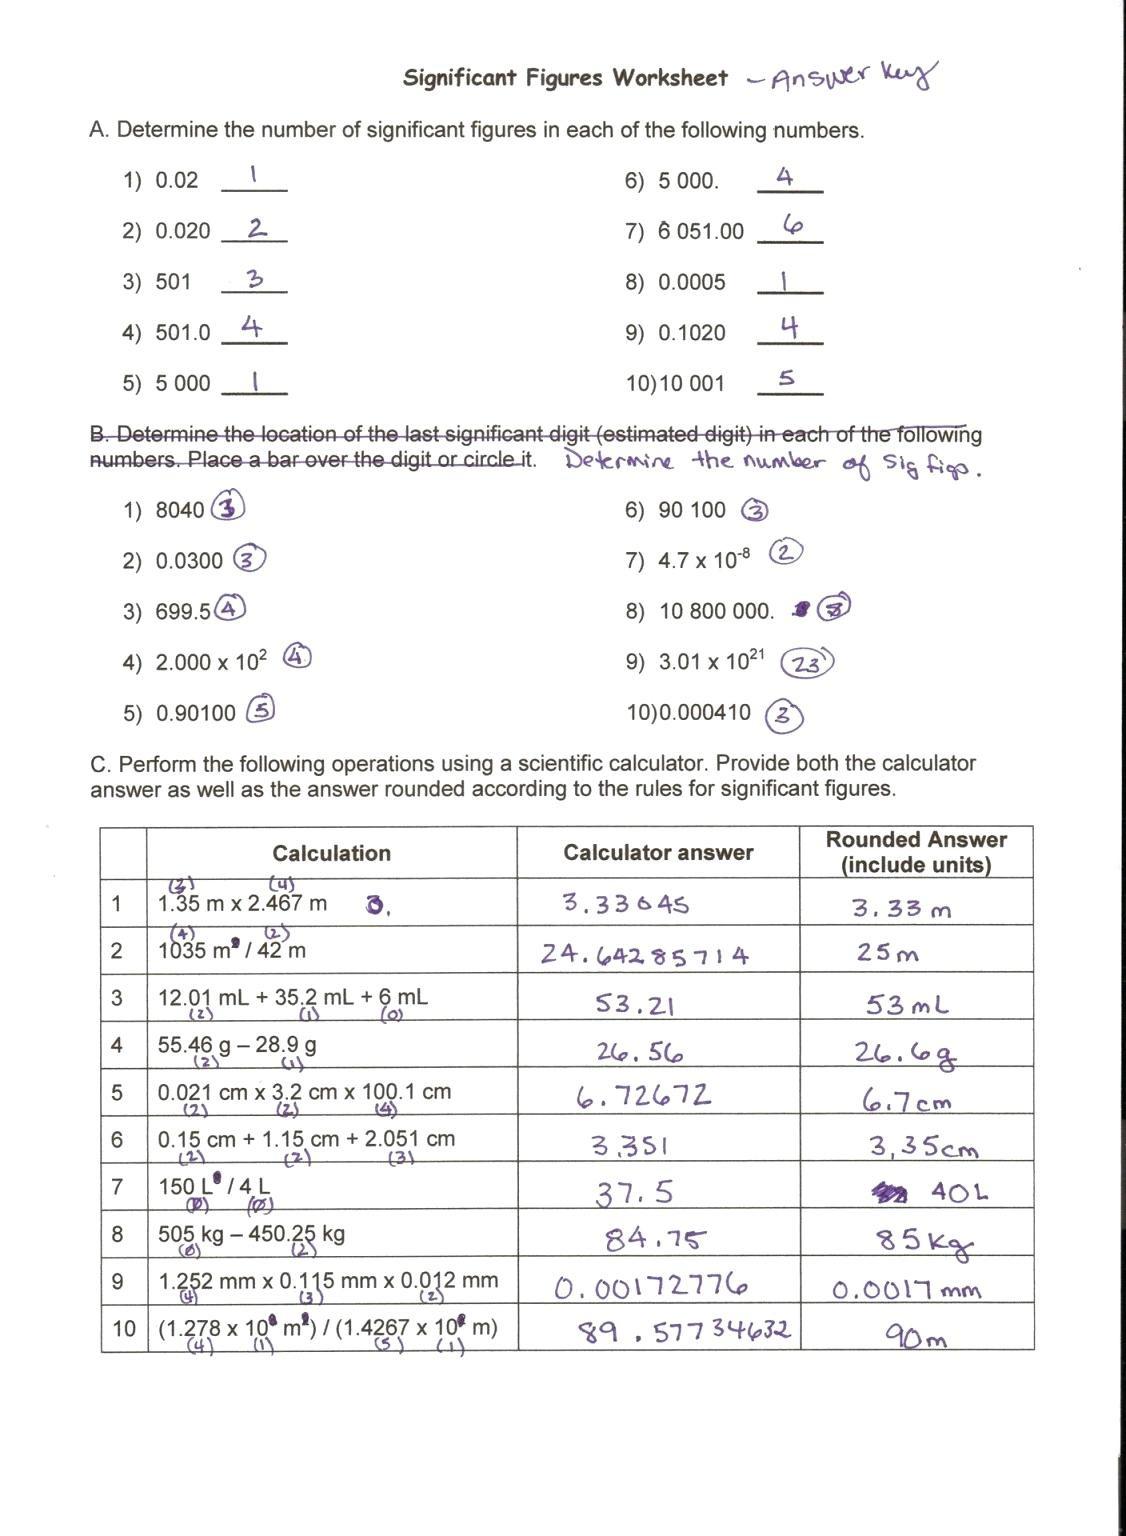 Metric Conversion Worksheet 1 Metric Conversion Worksheet with Answers Nidecmege